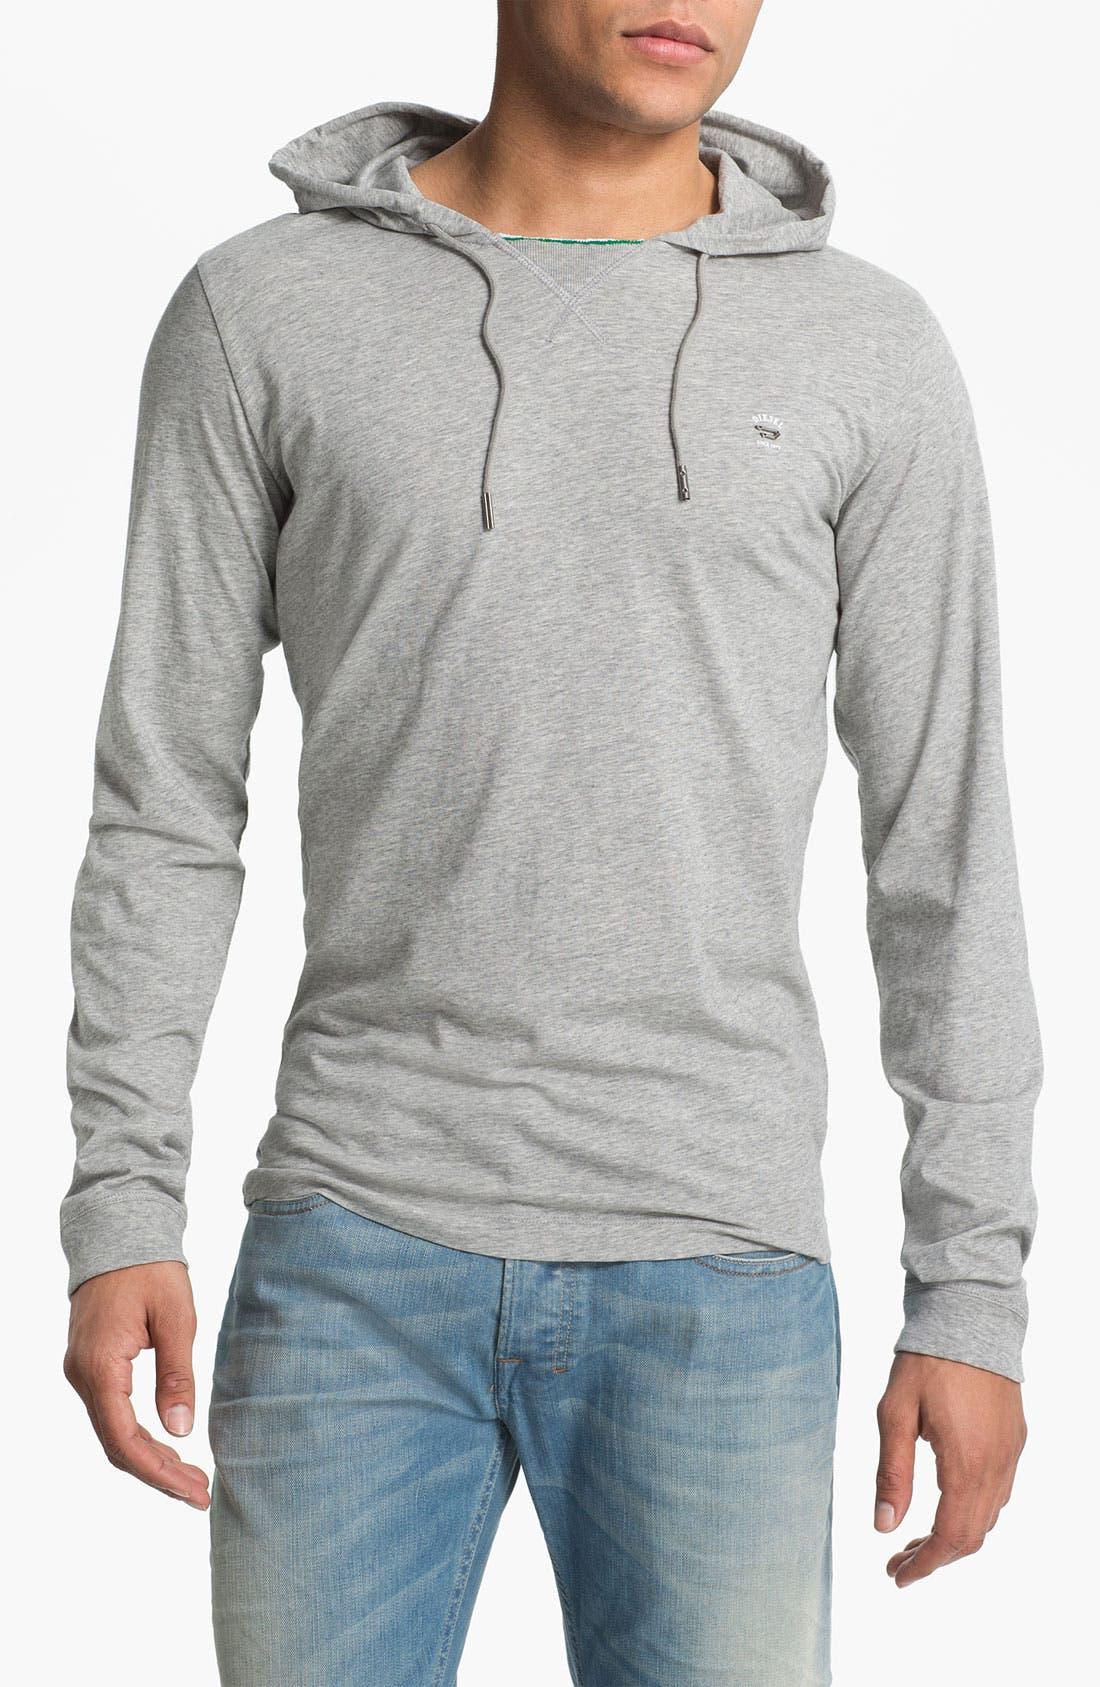 Alternate Image 1 Selected - DIESEL® 'T-Someone' Hooded Long Sleeve T-Shirt